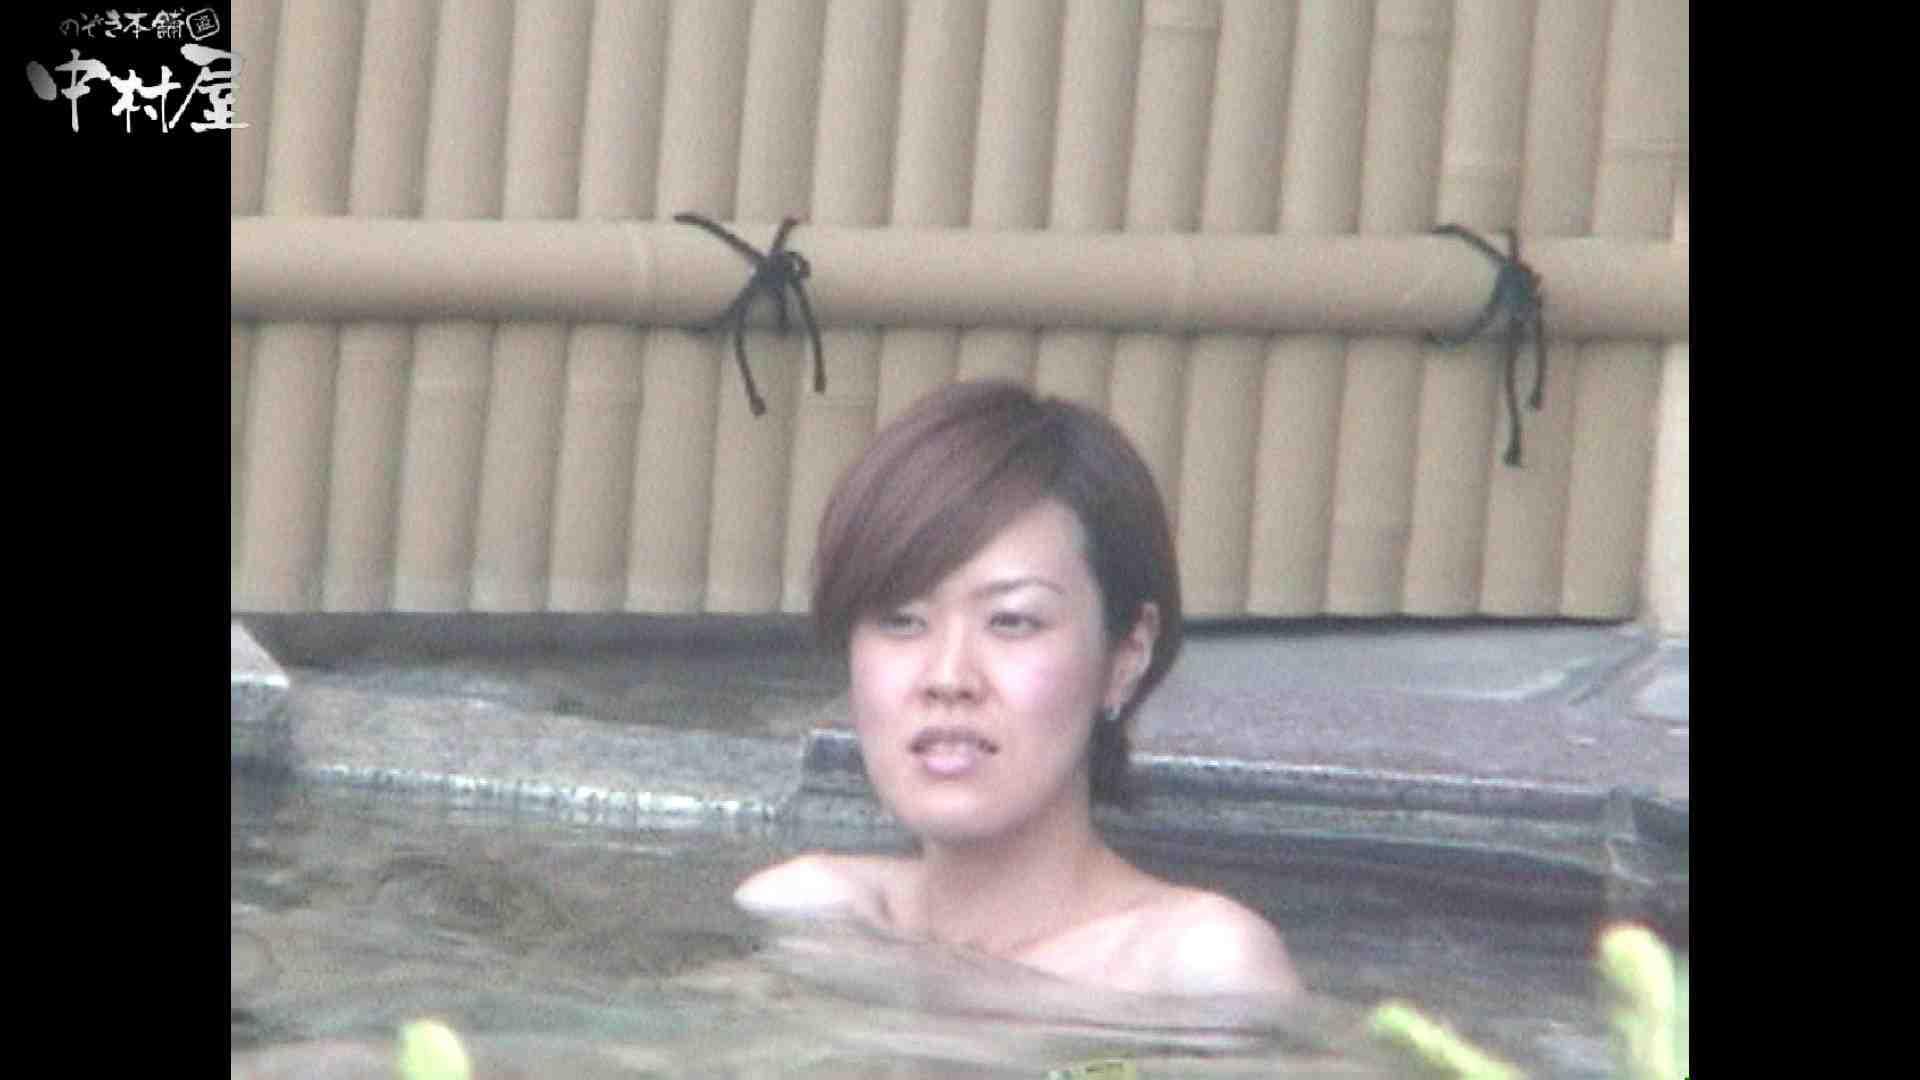 Aquaな露天風呂Vol.961 露天風呂 | OLのエロ生活  104連発 73